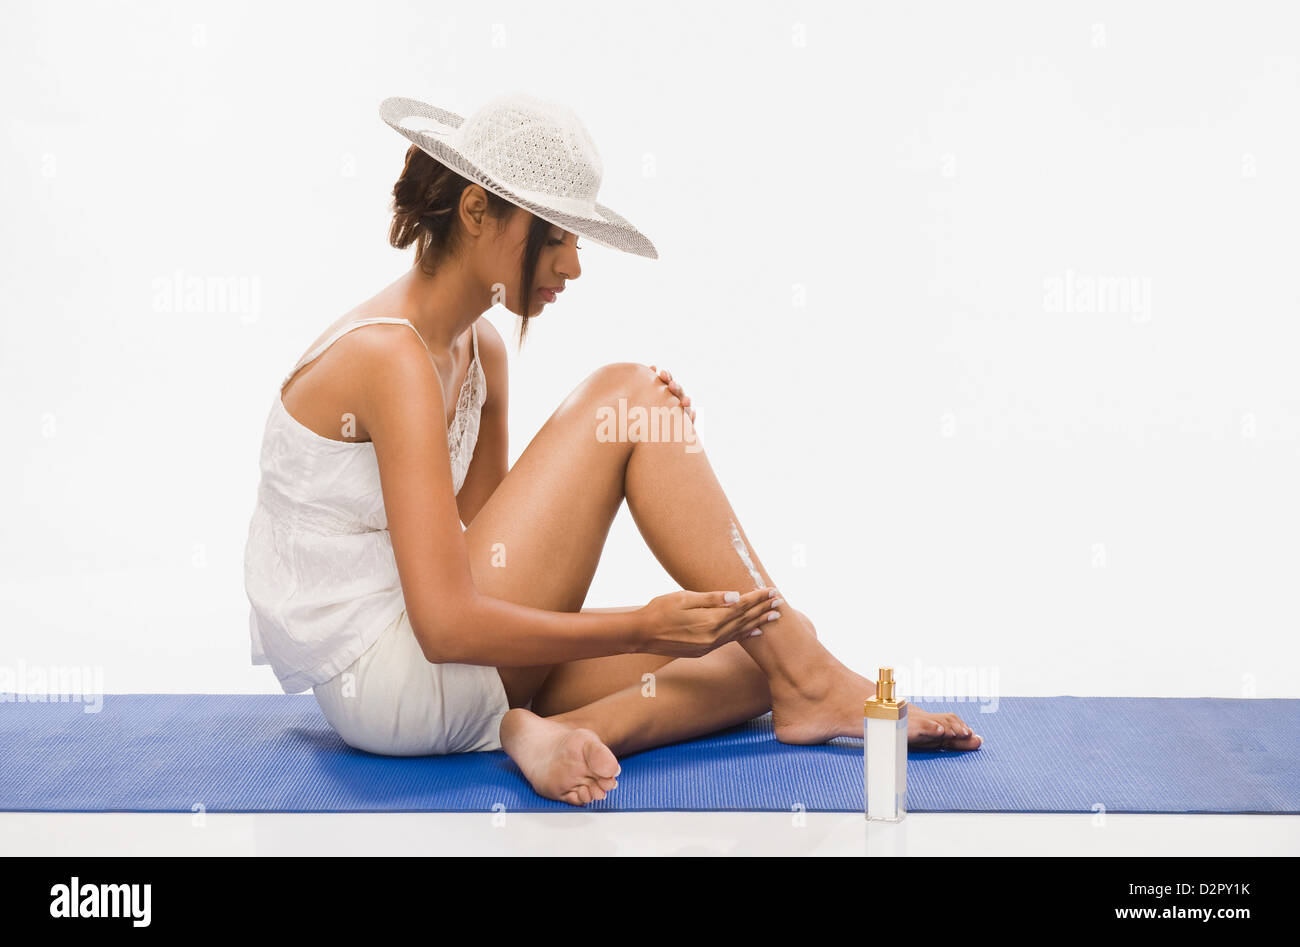 Woman applying suntan lotion - Stock Image